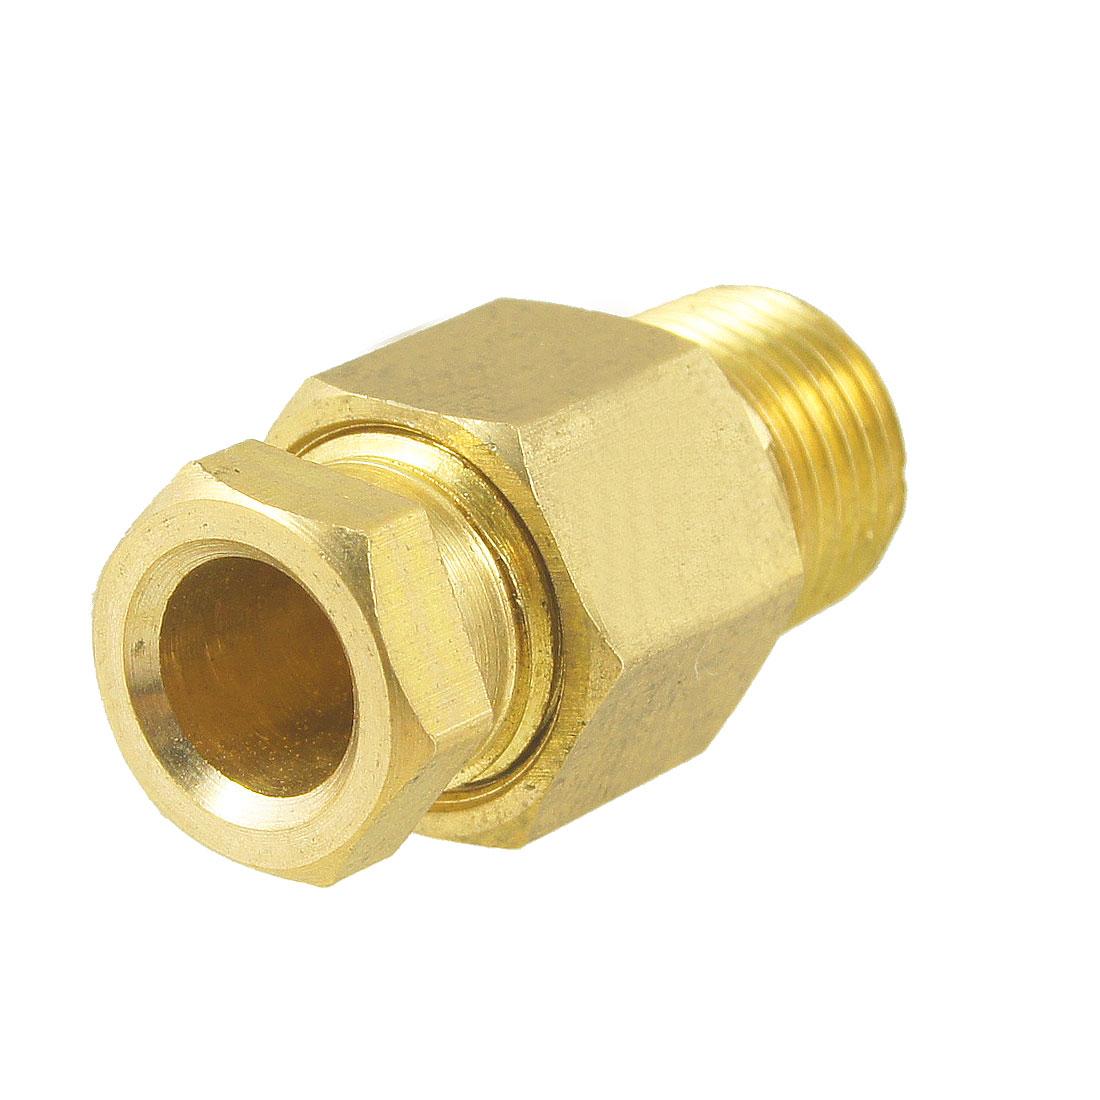 "6mm Hole Dia 1/8"" Male Thread Metal Straight Hydraulic Grease Nipple Fitting"